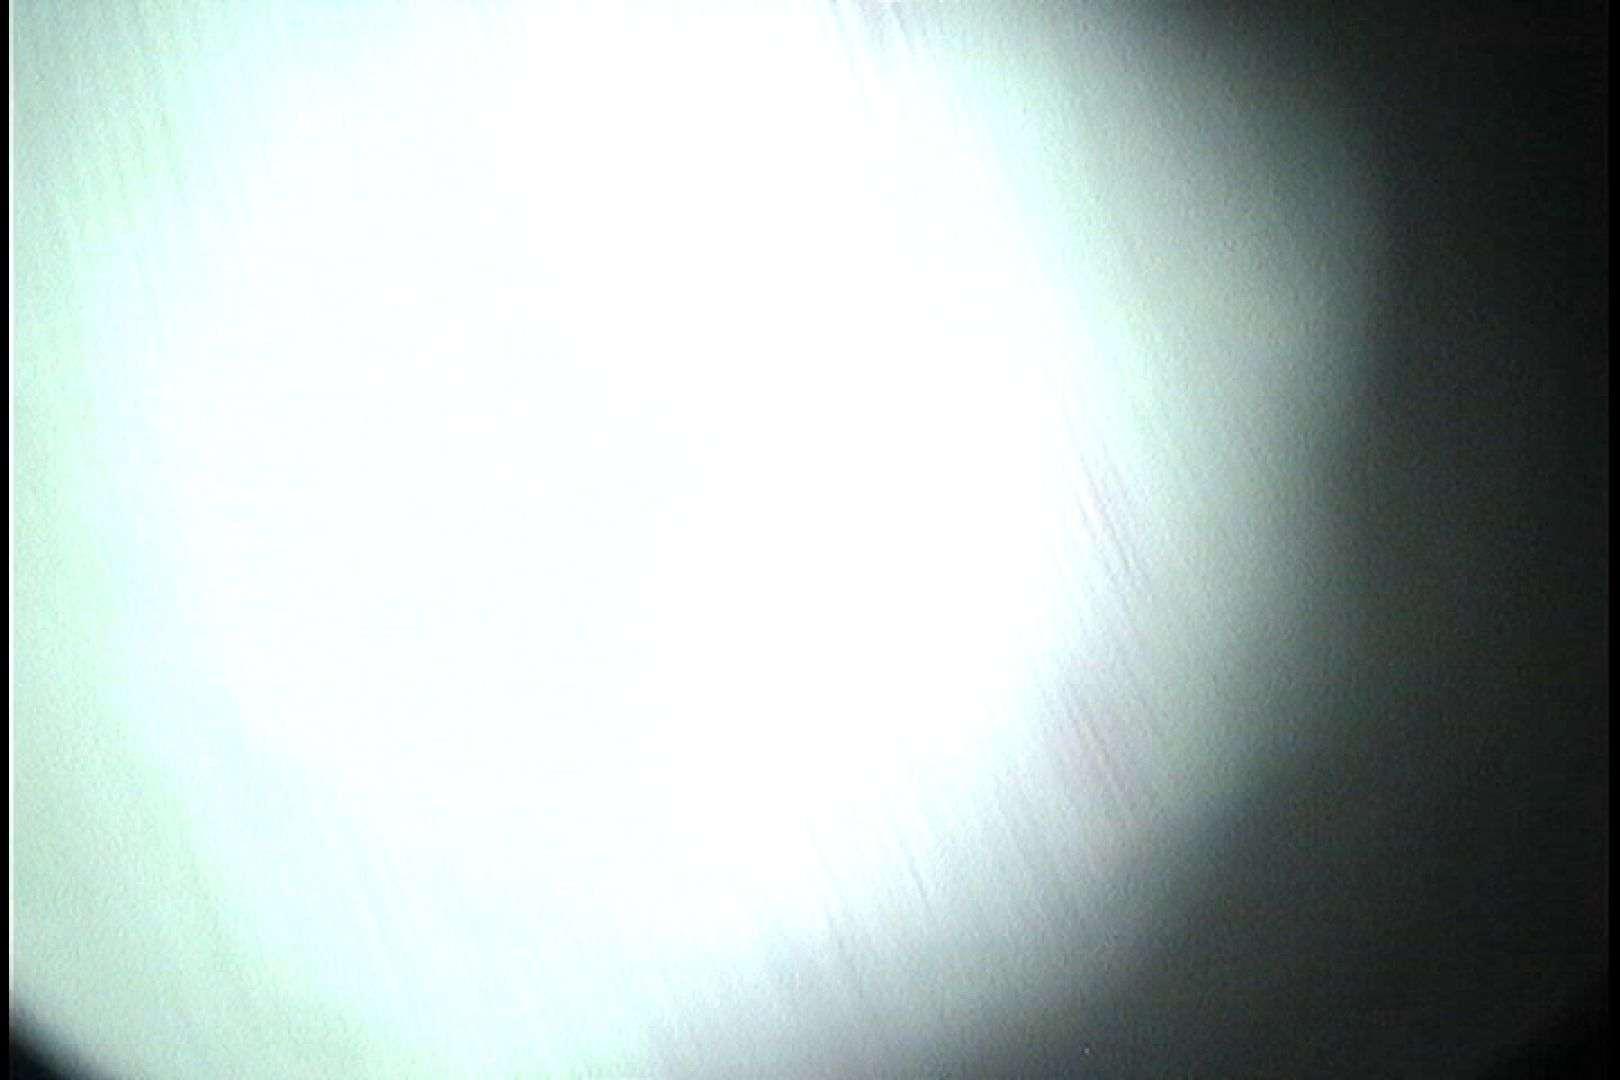 No.22 日焼け跡とオッパイの関係がおかしな貧乳ギャル 乙女  70pic 24